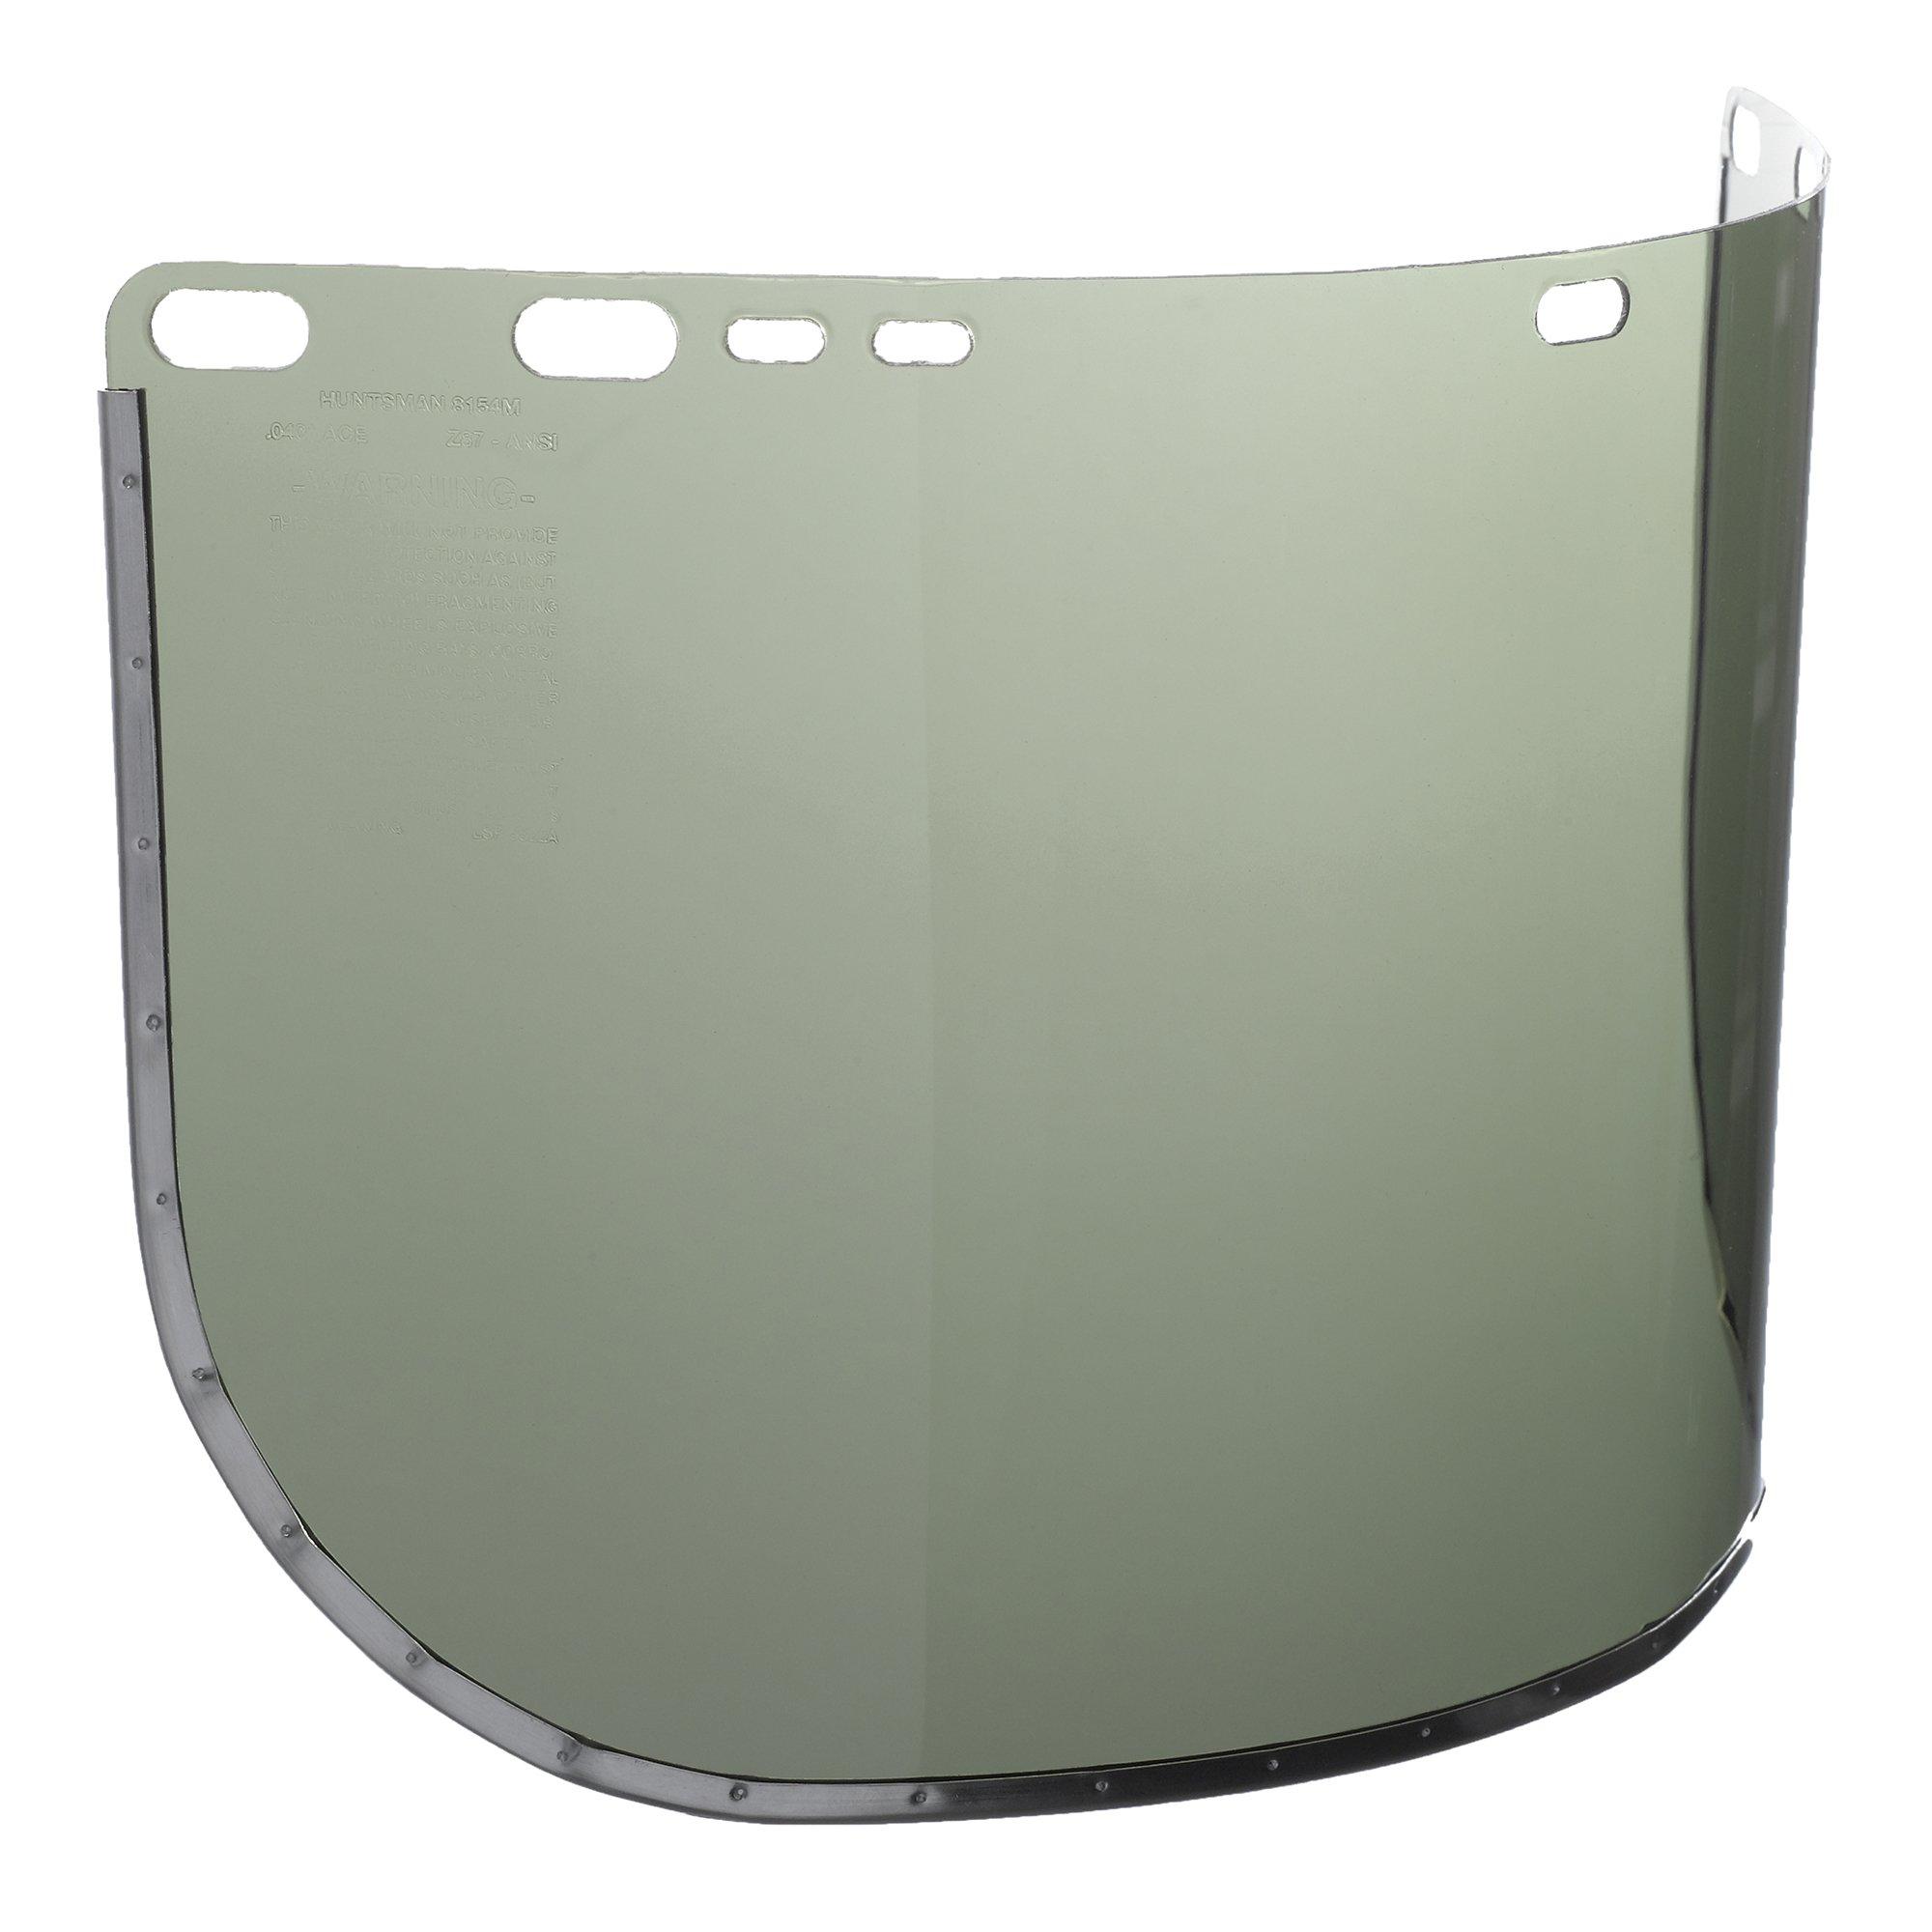 Jackson Safety F30 Acetate Face Shield (29082), 9'' x 15.5'', Light Green, Reusable Face Protection, 12 Shields / Case